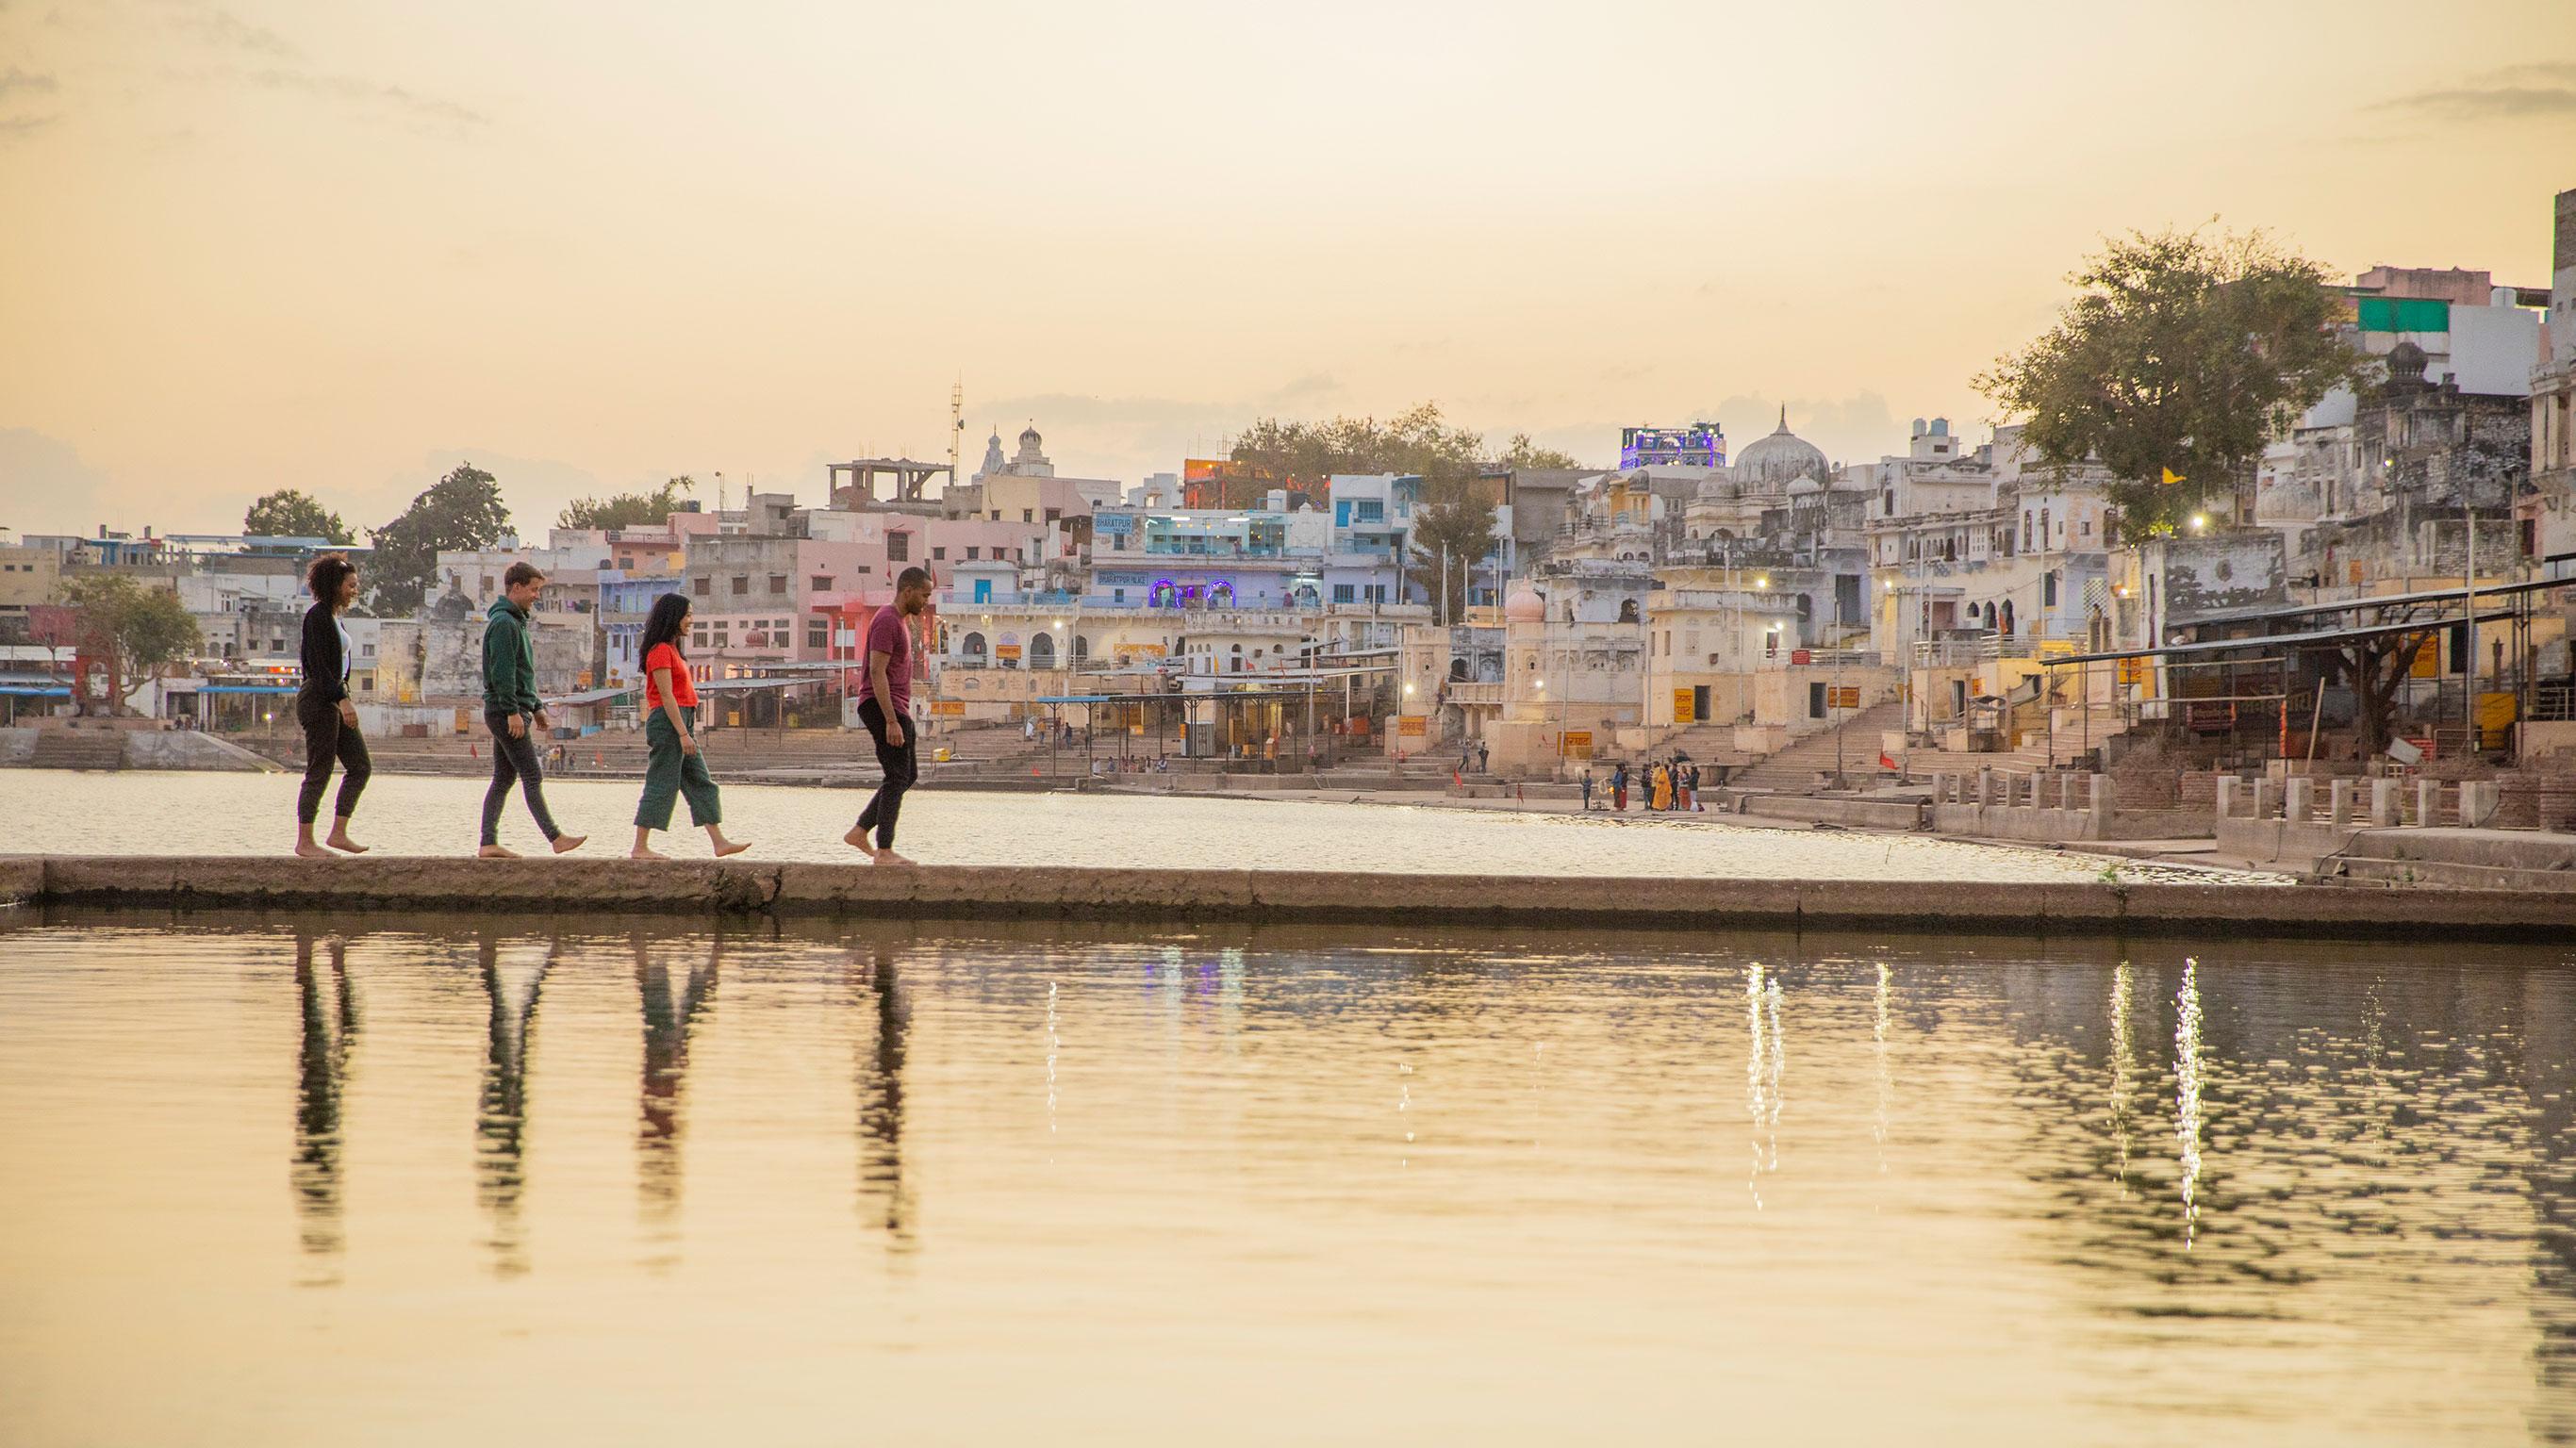 Rajasthan: Märkte & Mogulreich – Plus